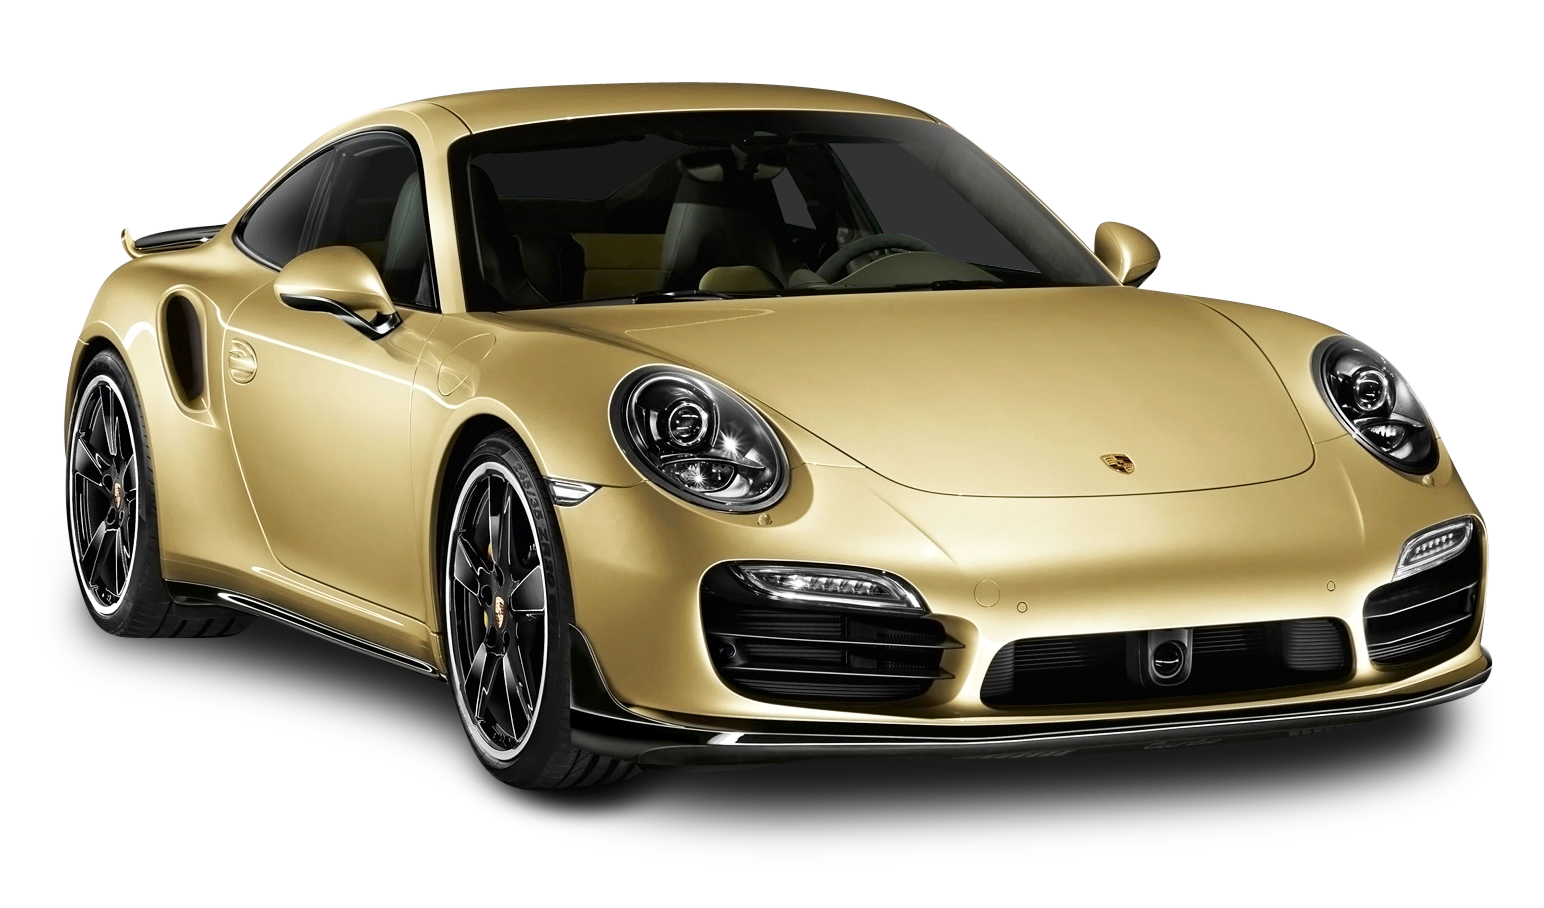 Gold Porsche 911 Turbo Aerokit Car PNG Image